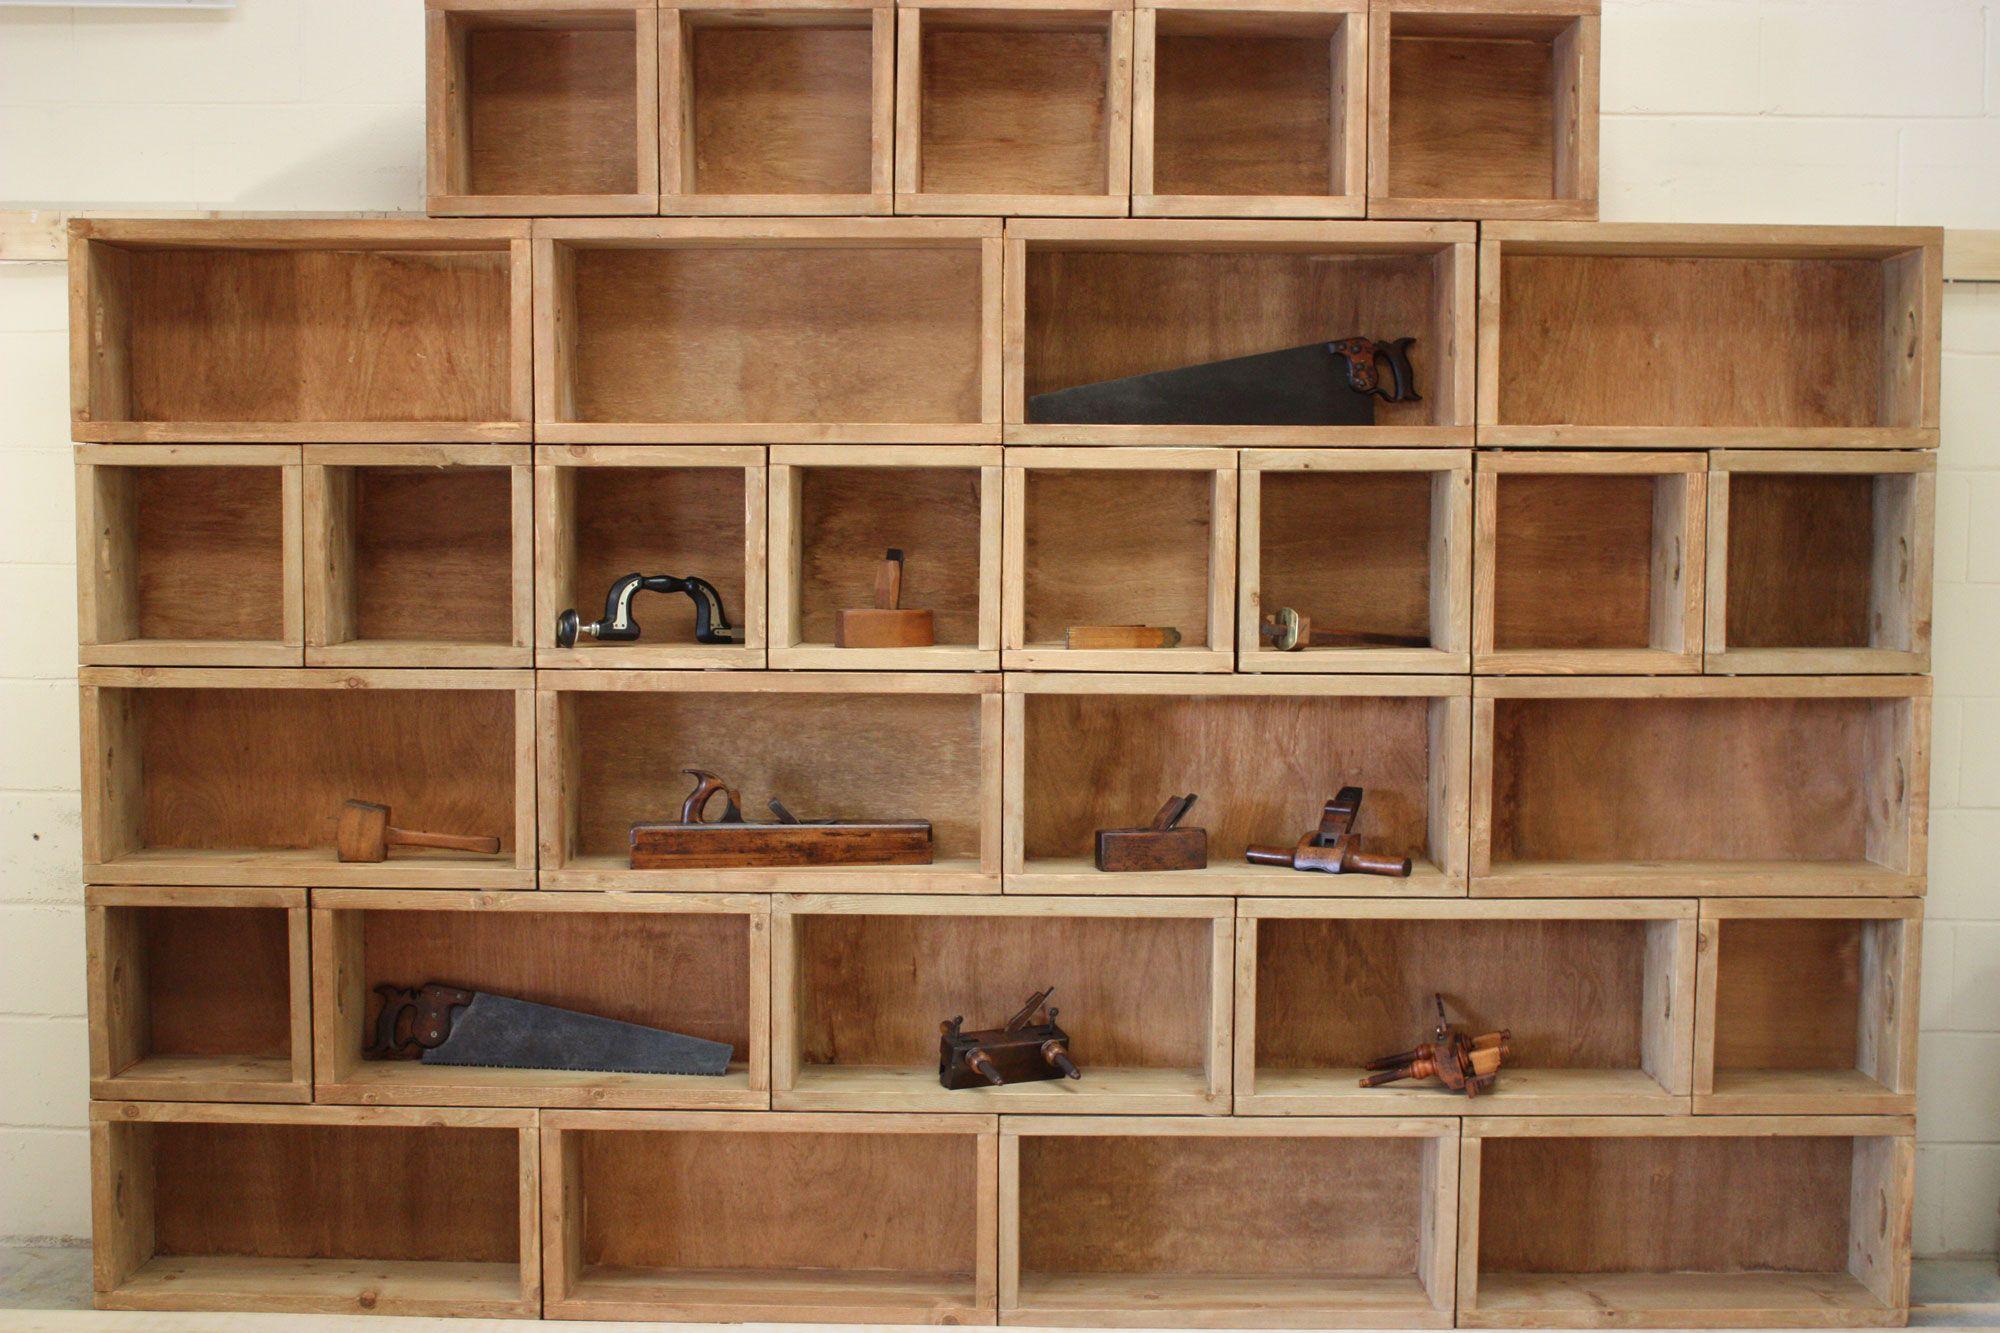 Shelves Stackable Shelving Ikea Kallax Shelf Singapore Stackable Boxes Saw Tools Wooden Modern Stackable Storage Boxes Wood Storage Box Stackable Storage Bins